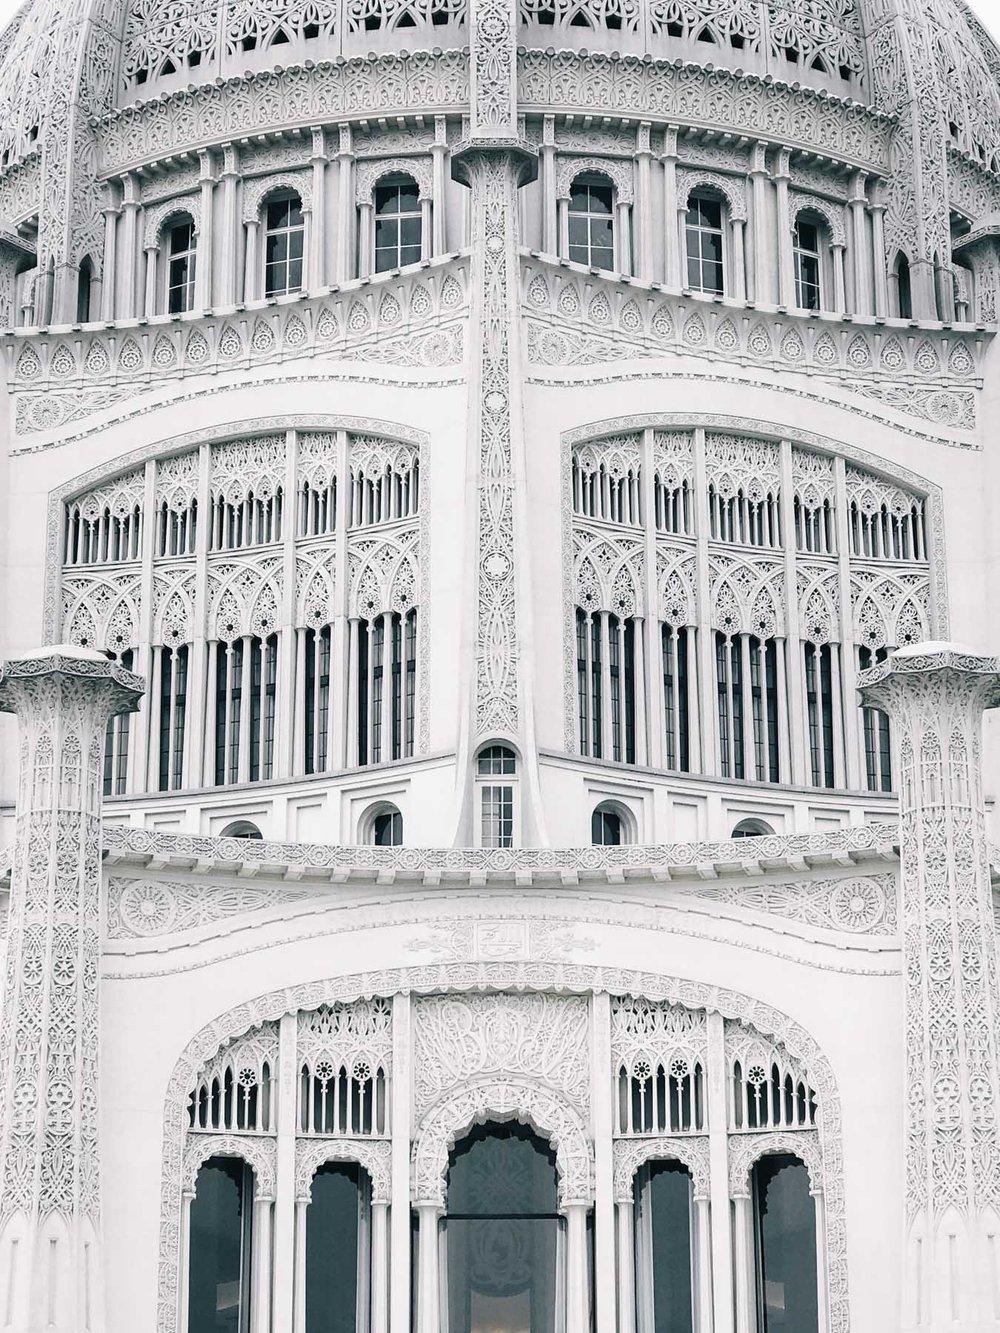 Baha'i House of Worship.